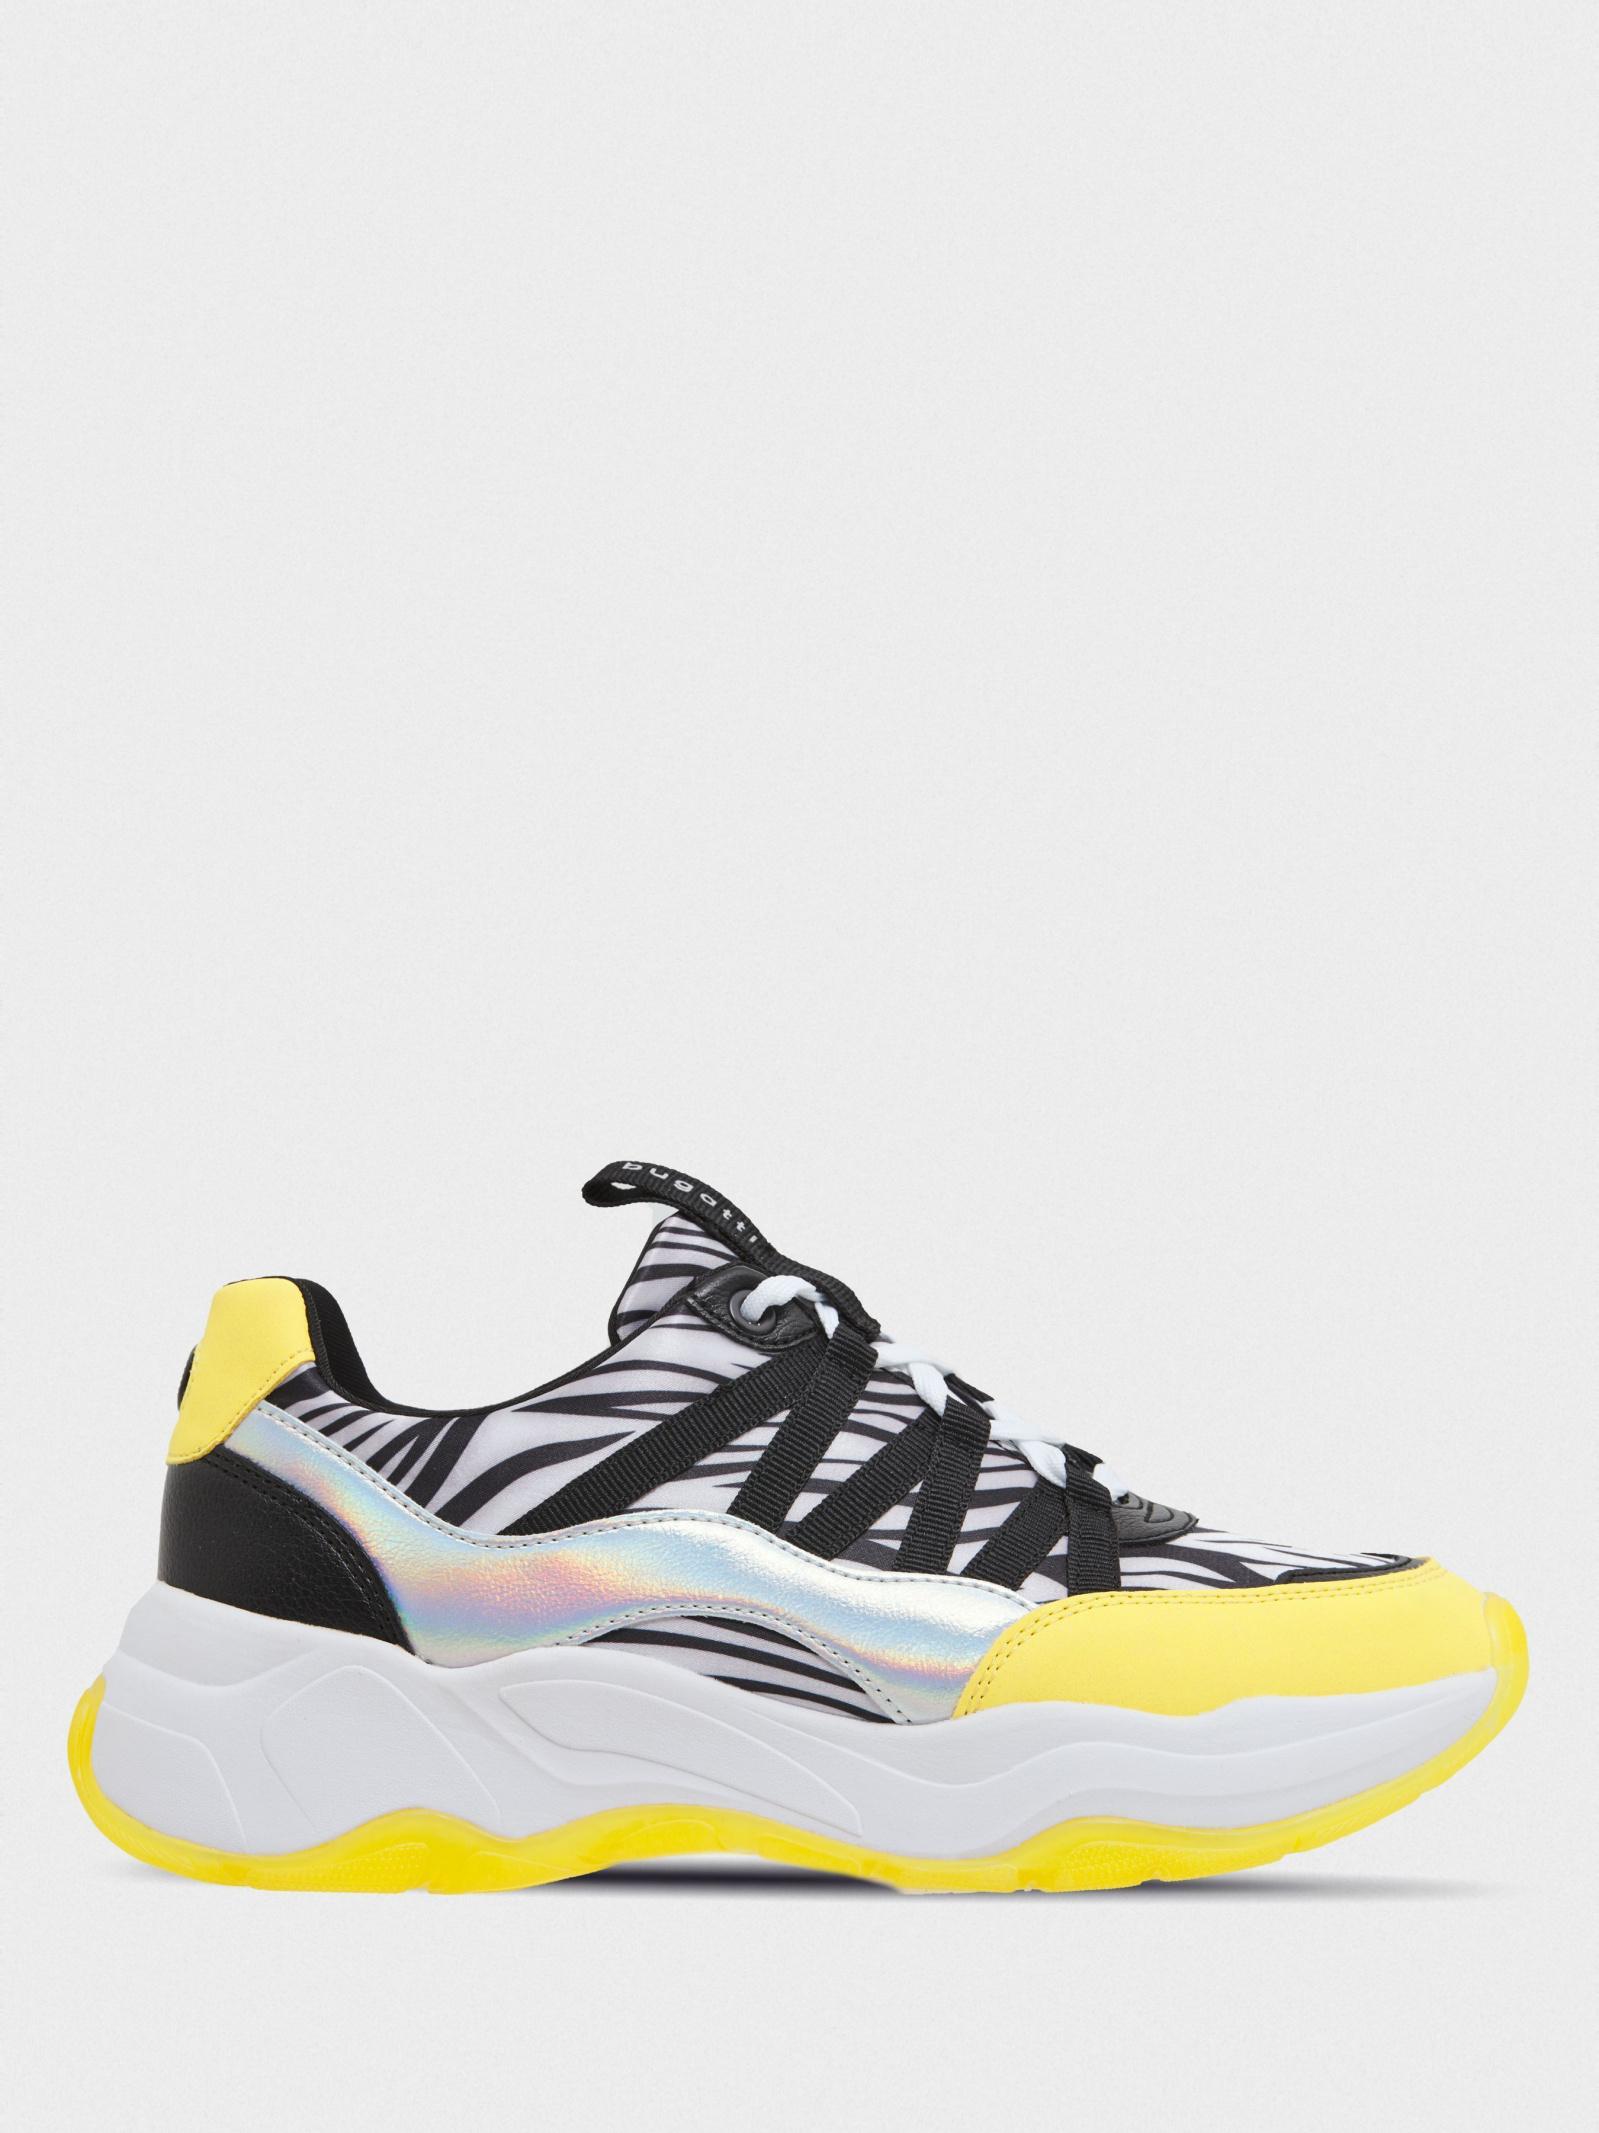 Кроссовки для женщин Bugatti sneakers YE153 купить обувь, 2017